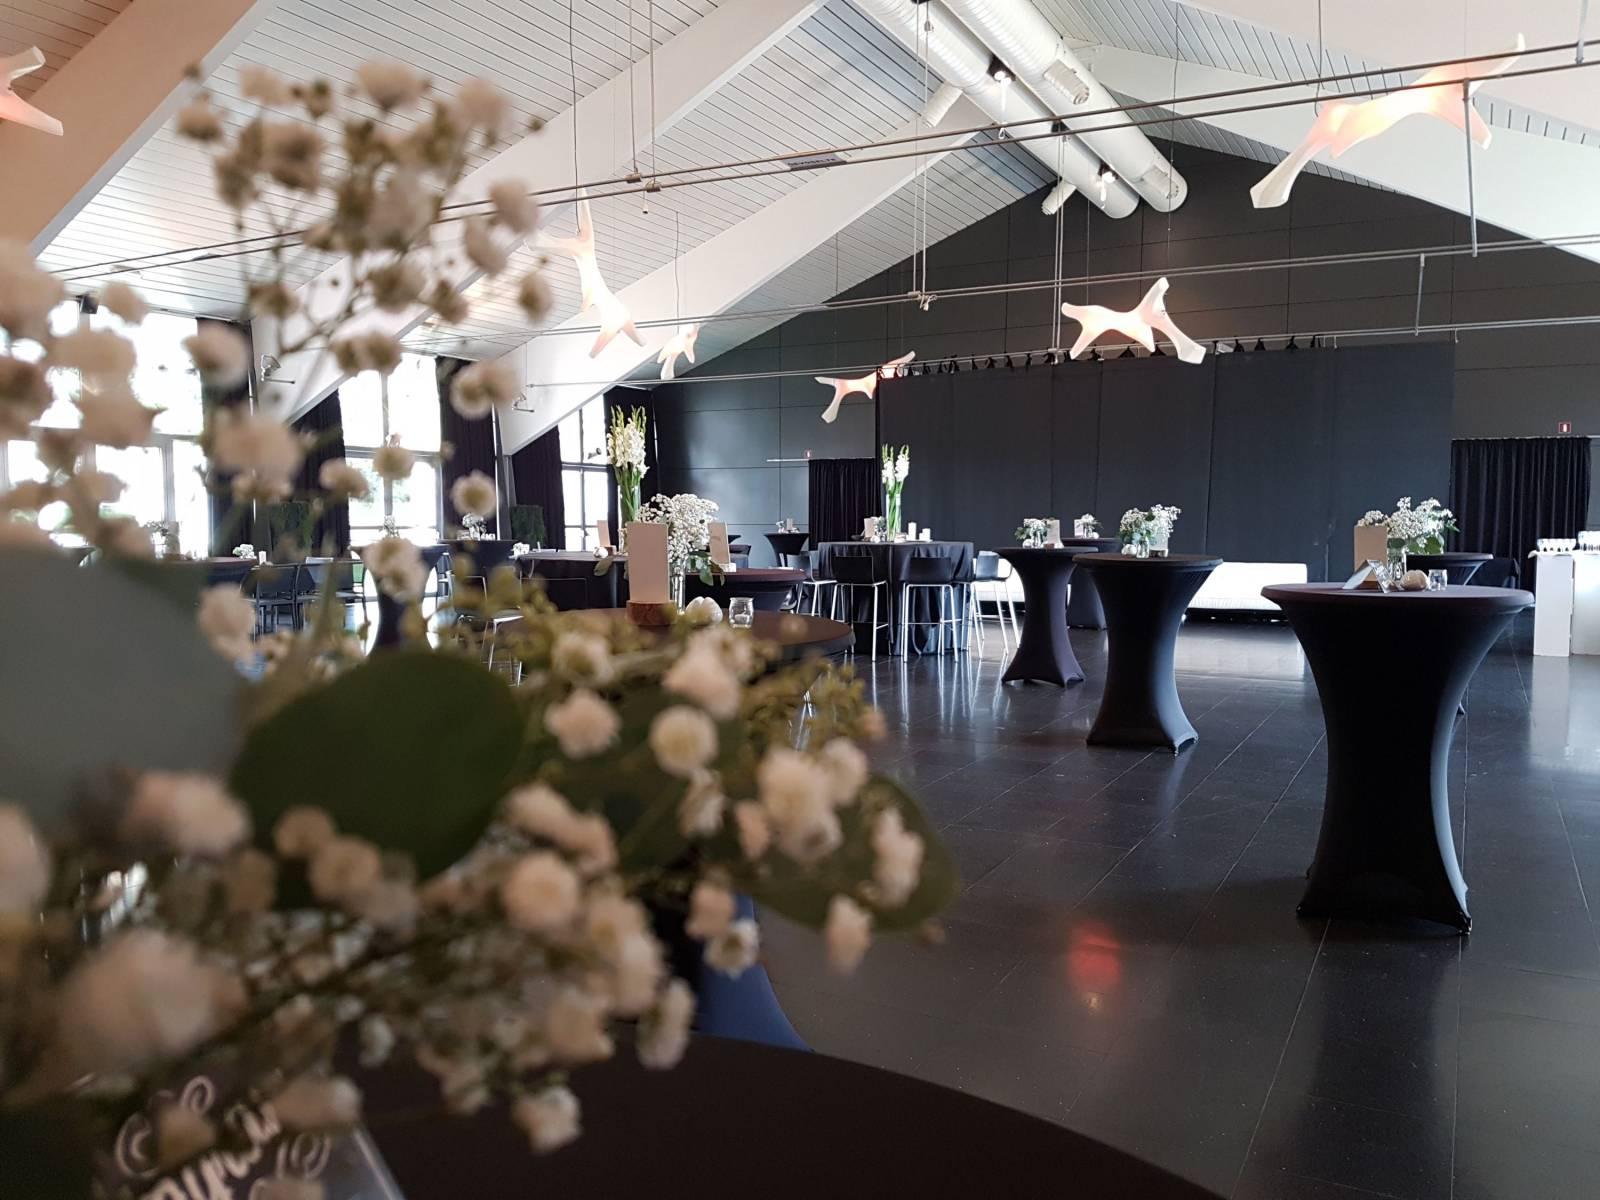 Domein Vossenberg - Feestzaal - House of Weddings - 8